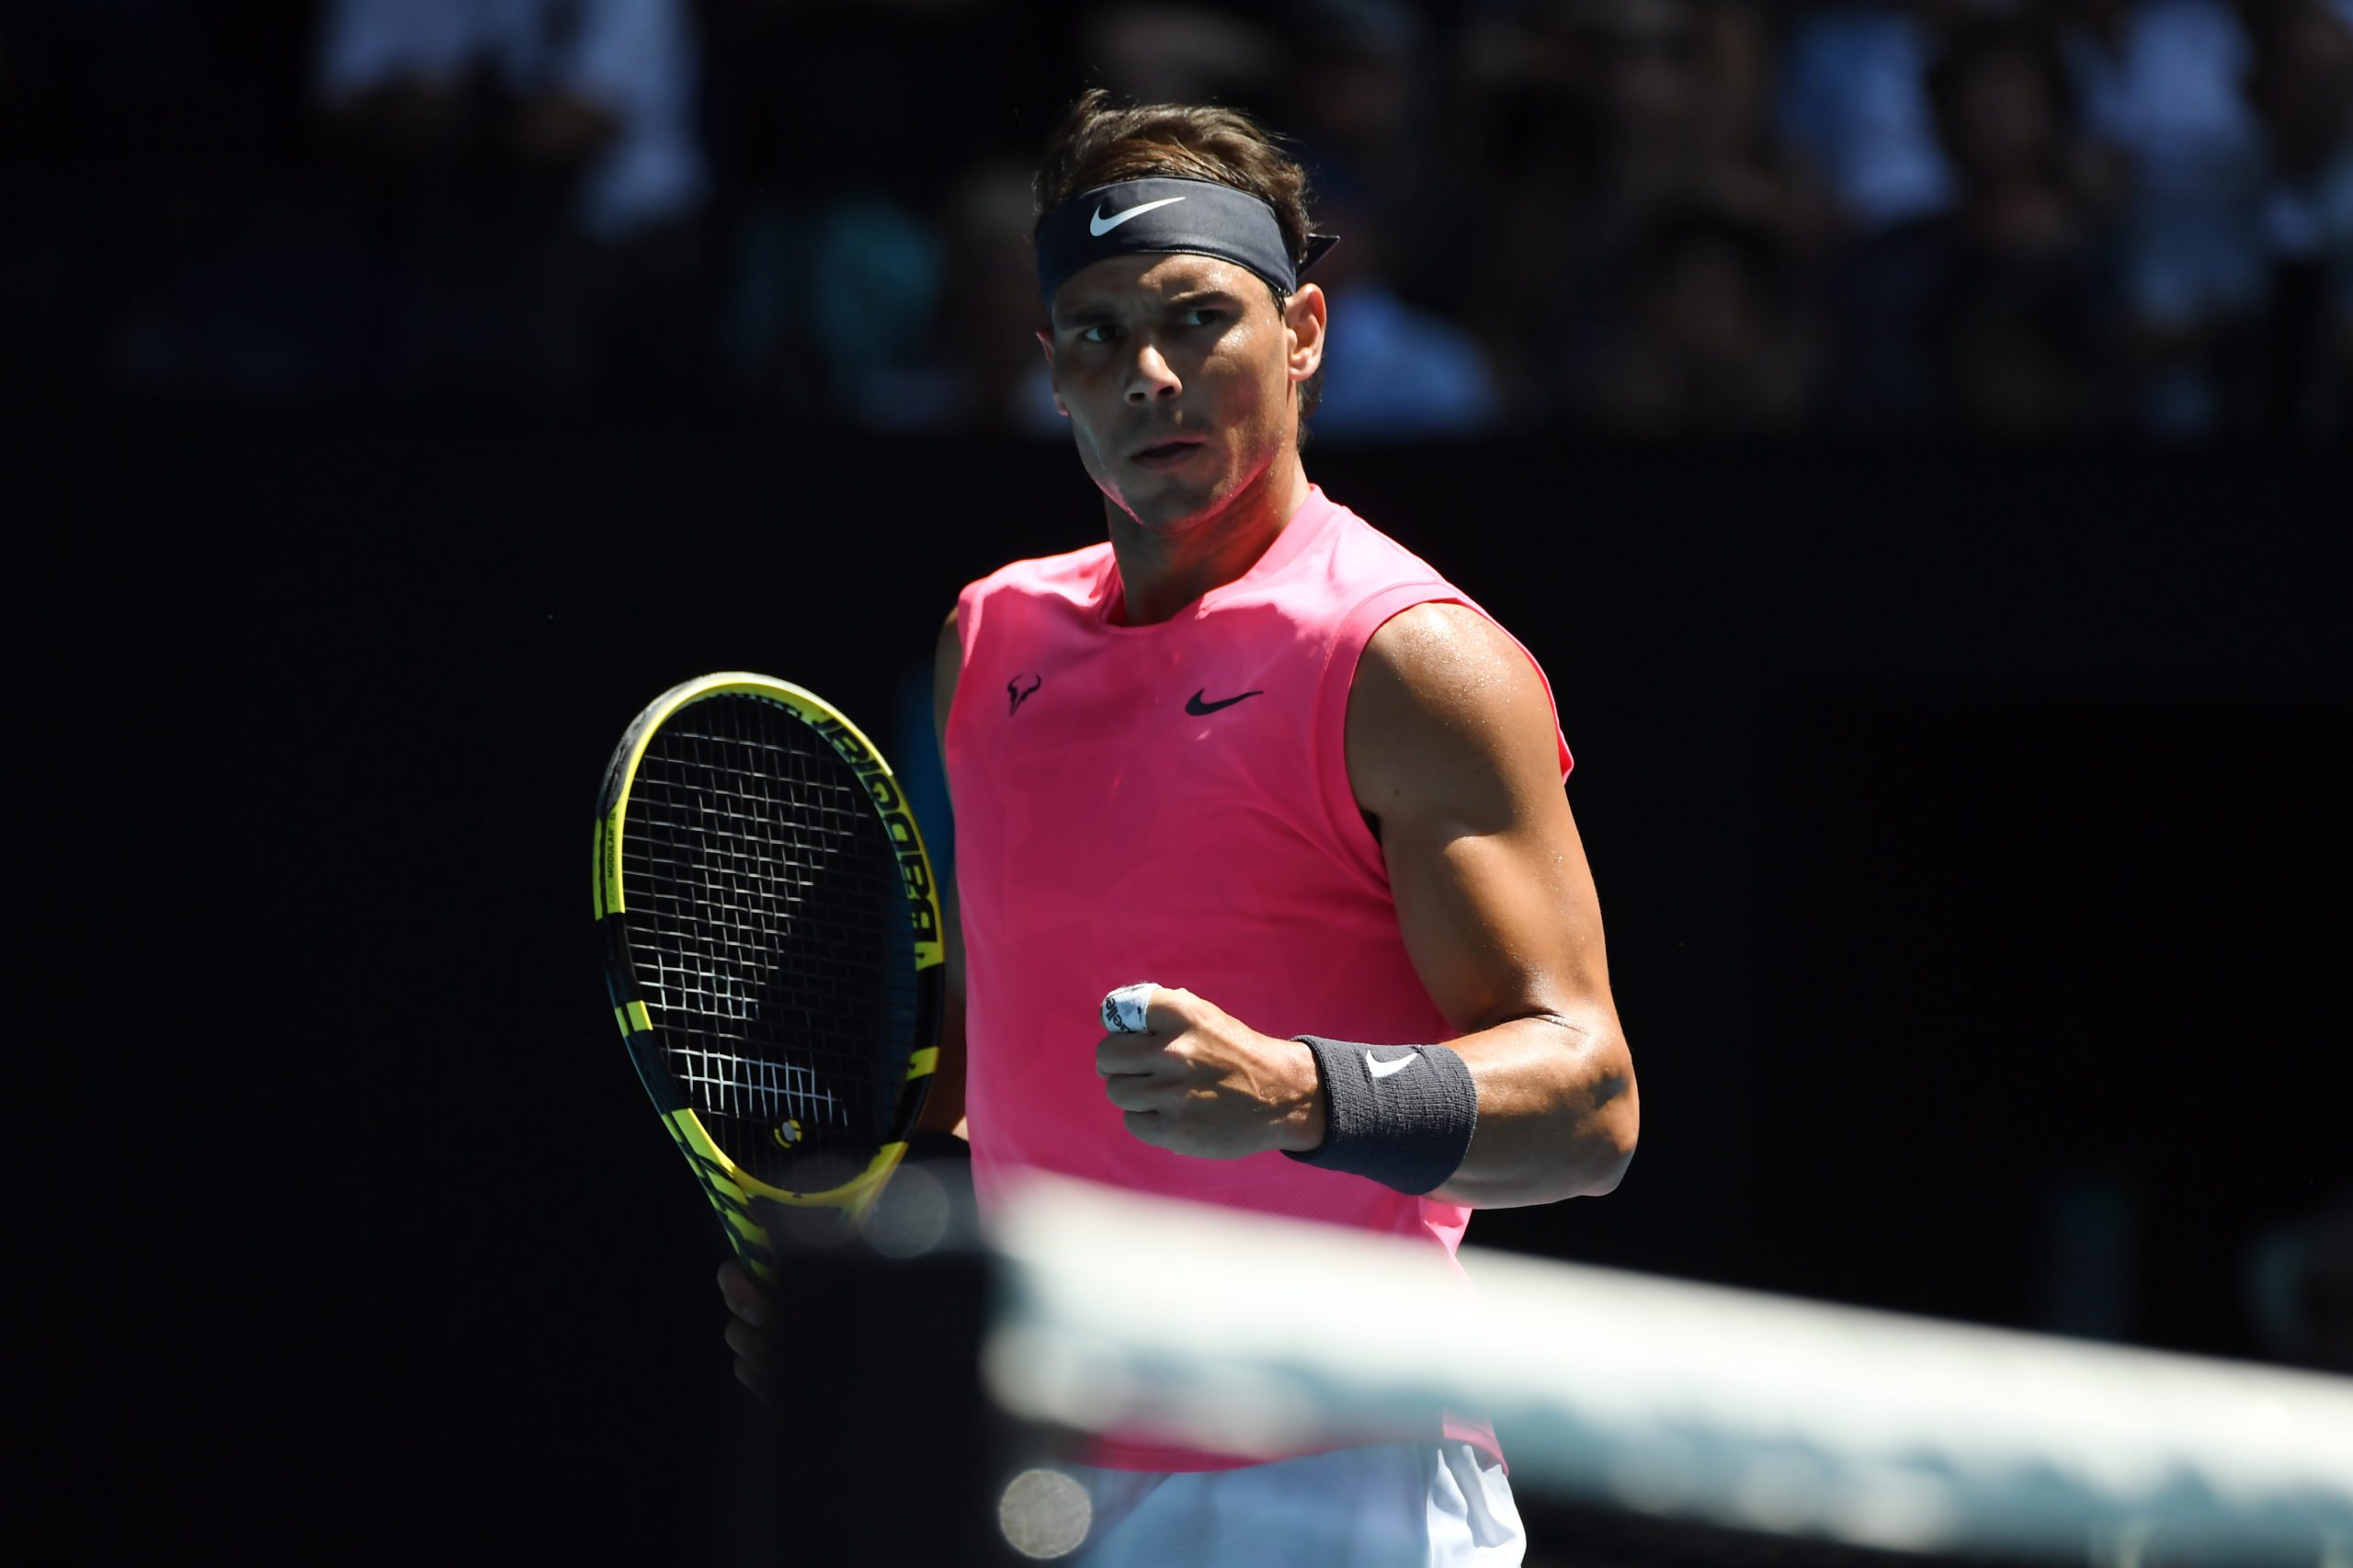 Australian Open. Kolejne zwycięstwo Nadala, porażka De Minaura